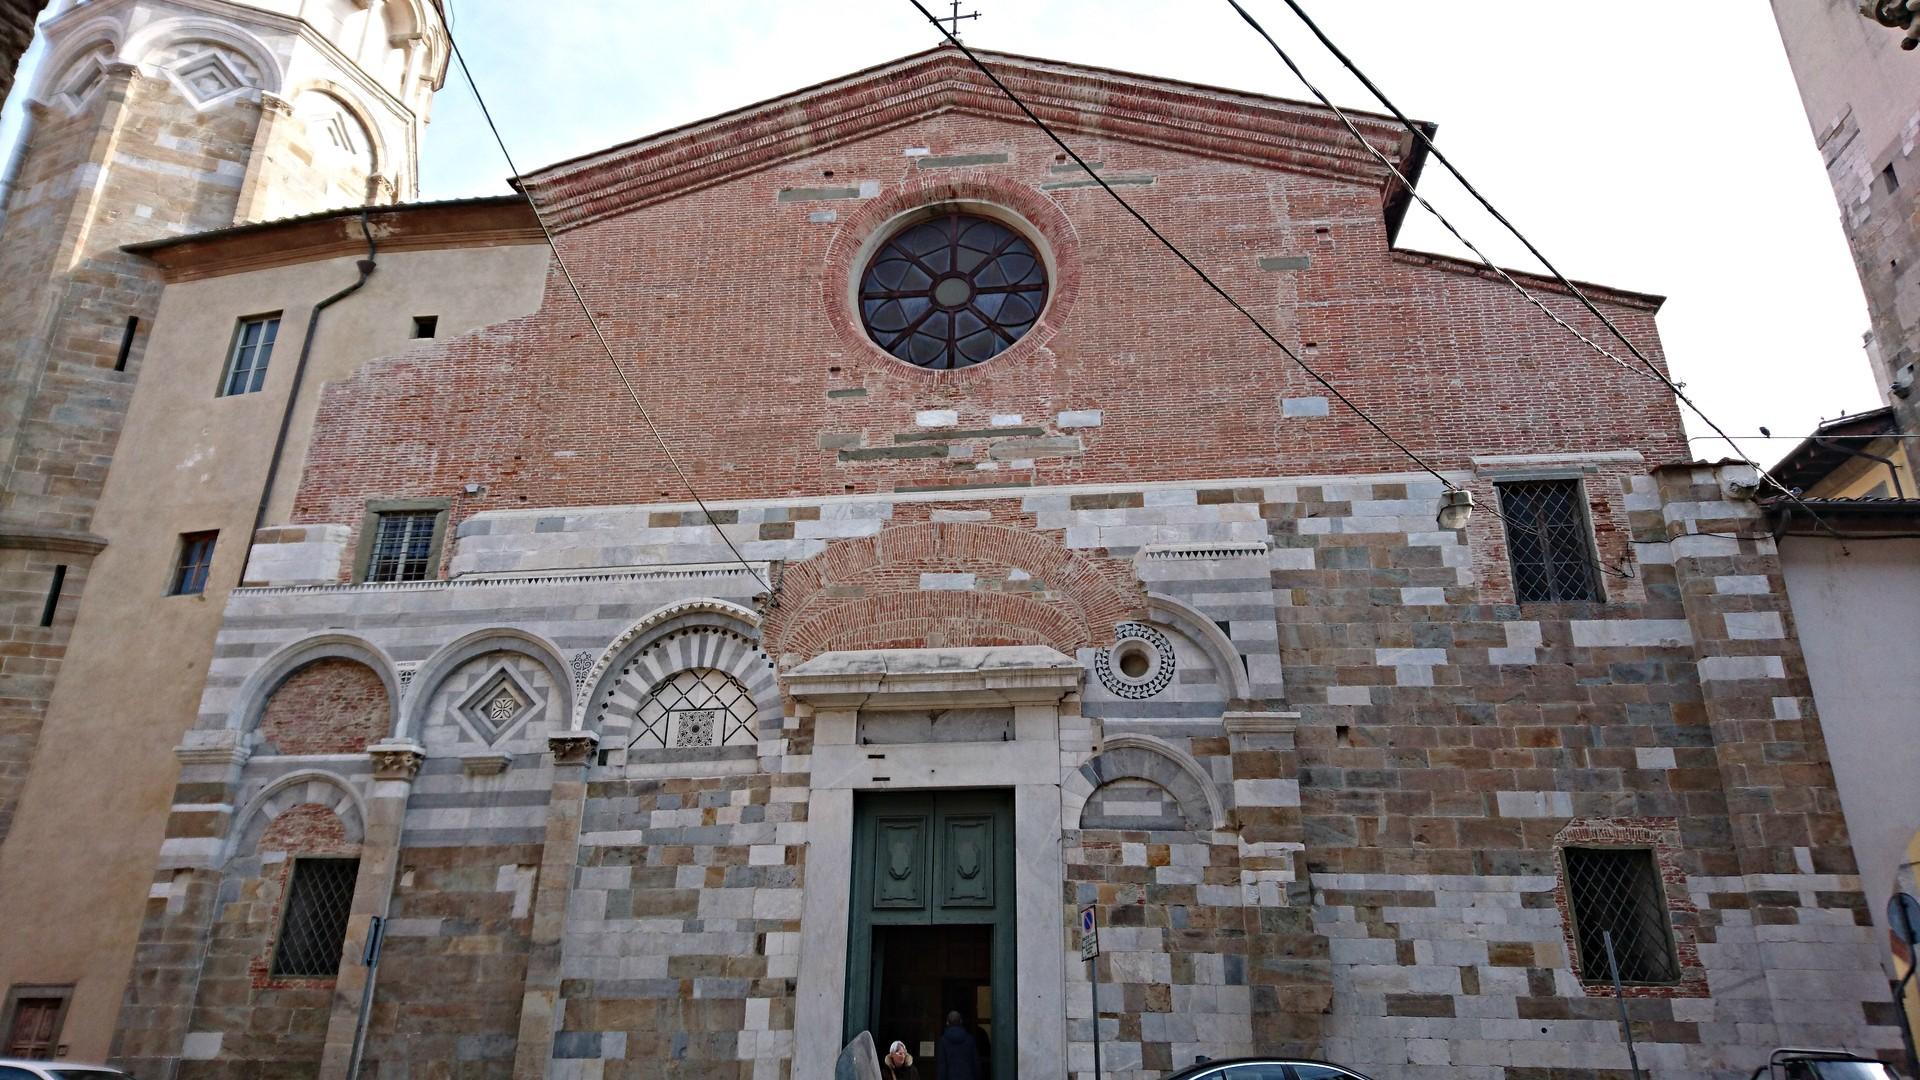 churches-and-their-beauty-1b7fce5e567511